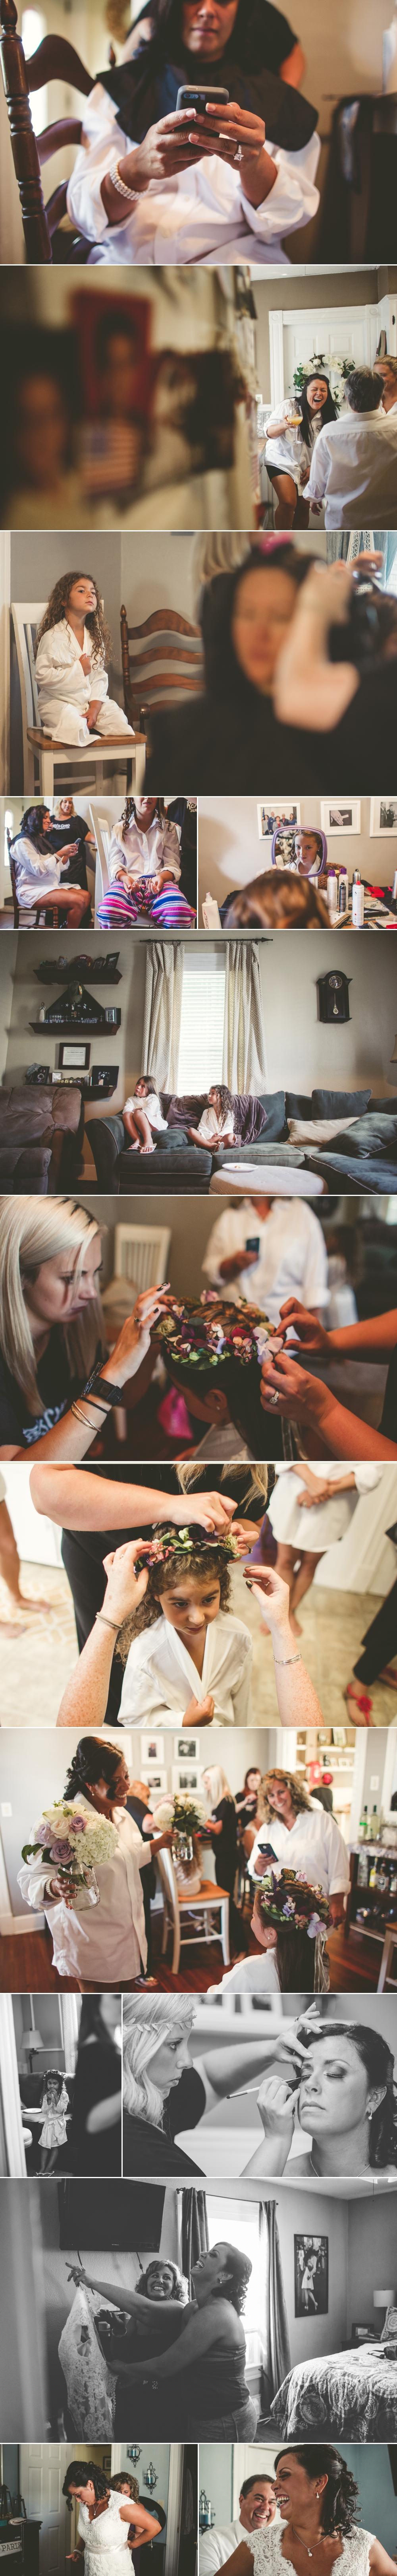 jason_domingues_photography_best_photographer_kansas_city_kc_wedding_engagement_rhode_island_massachusetts_destination_creative_documentary_portraits_experienced_weddings